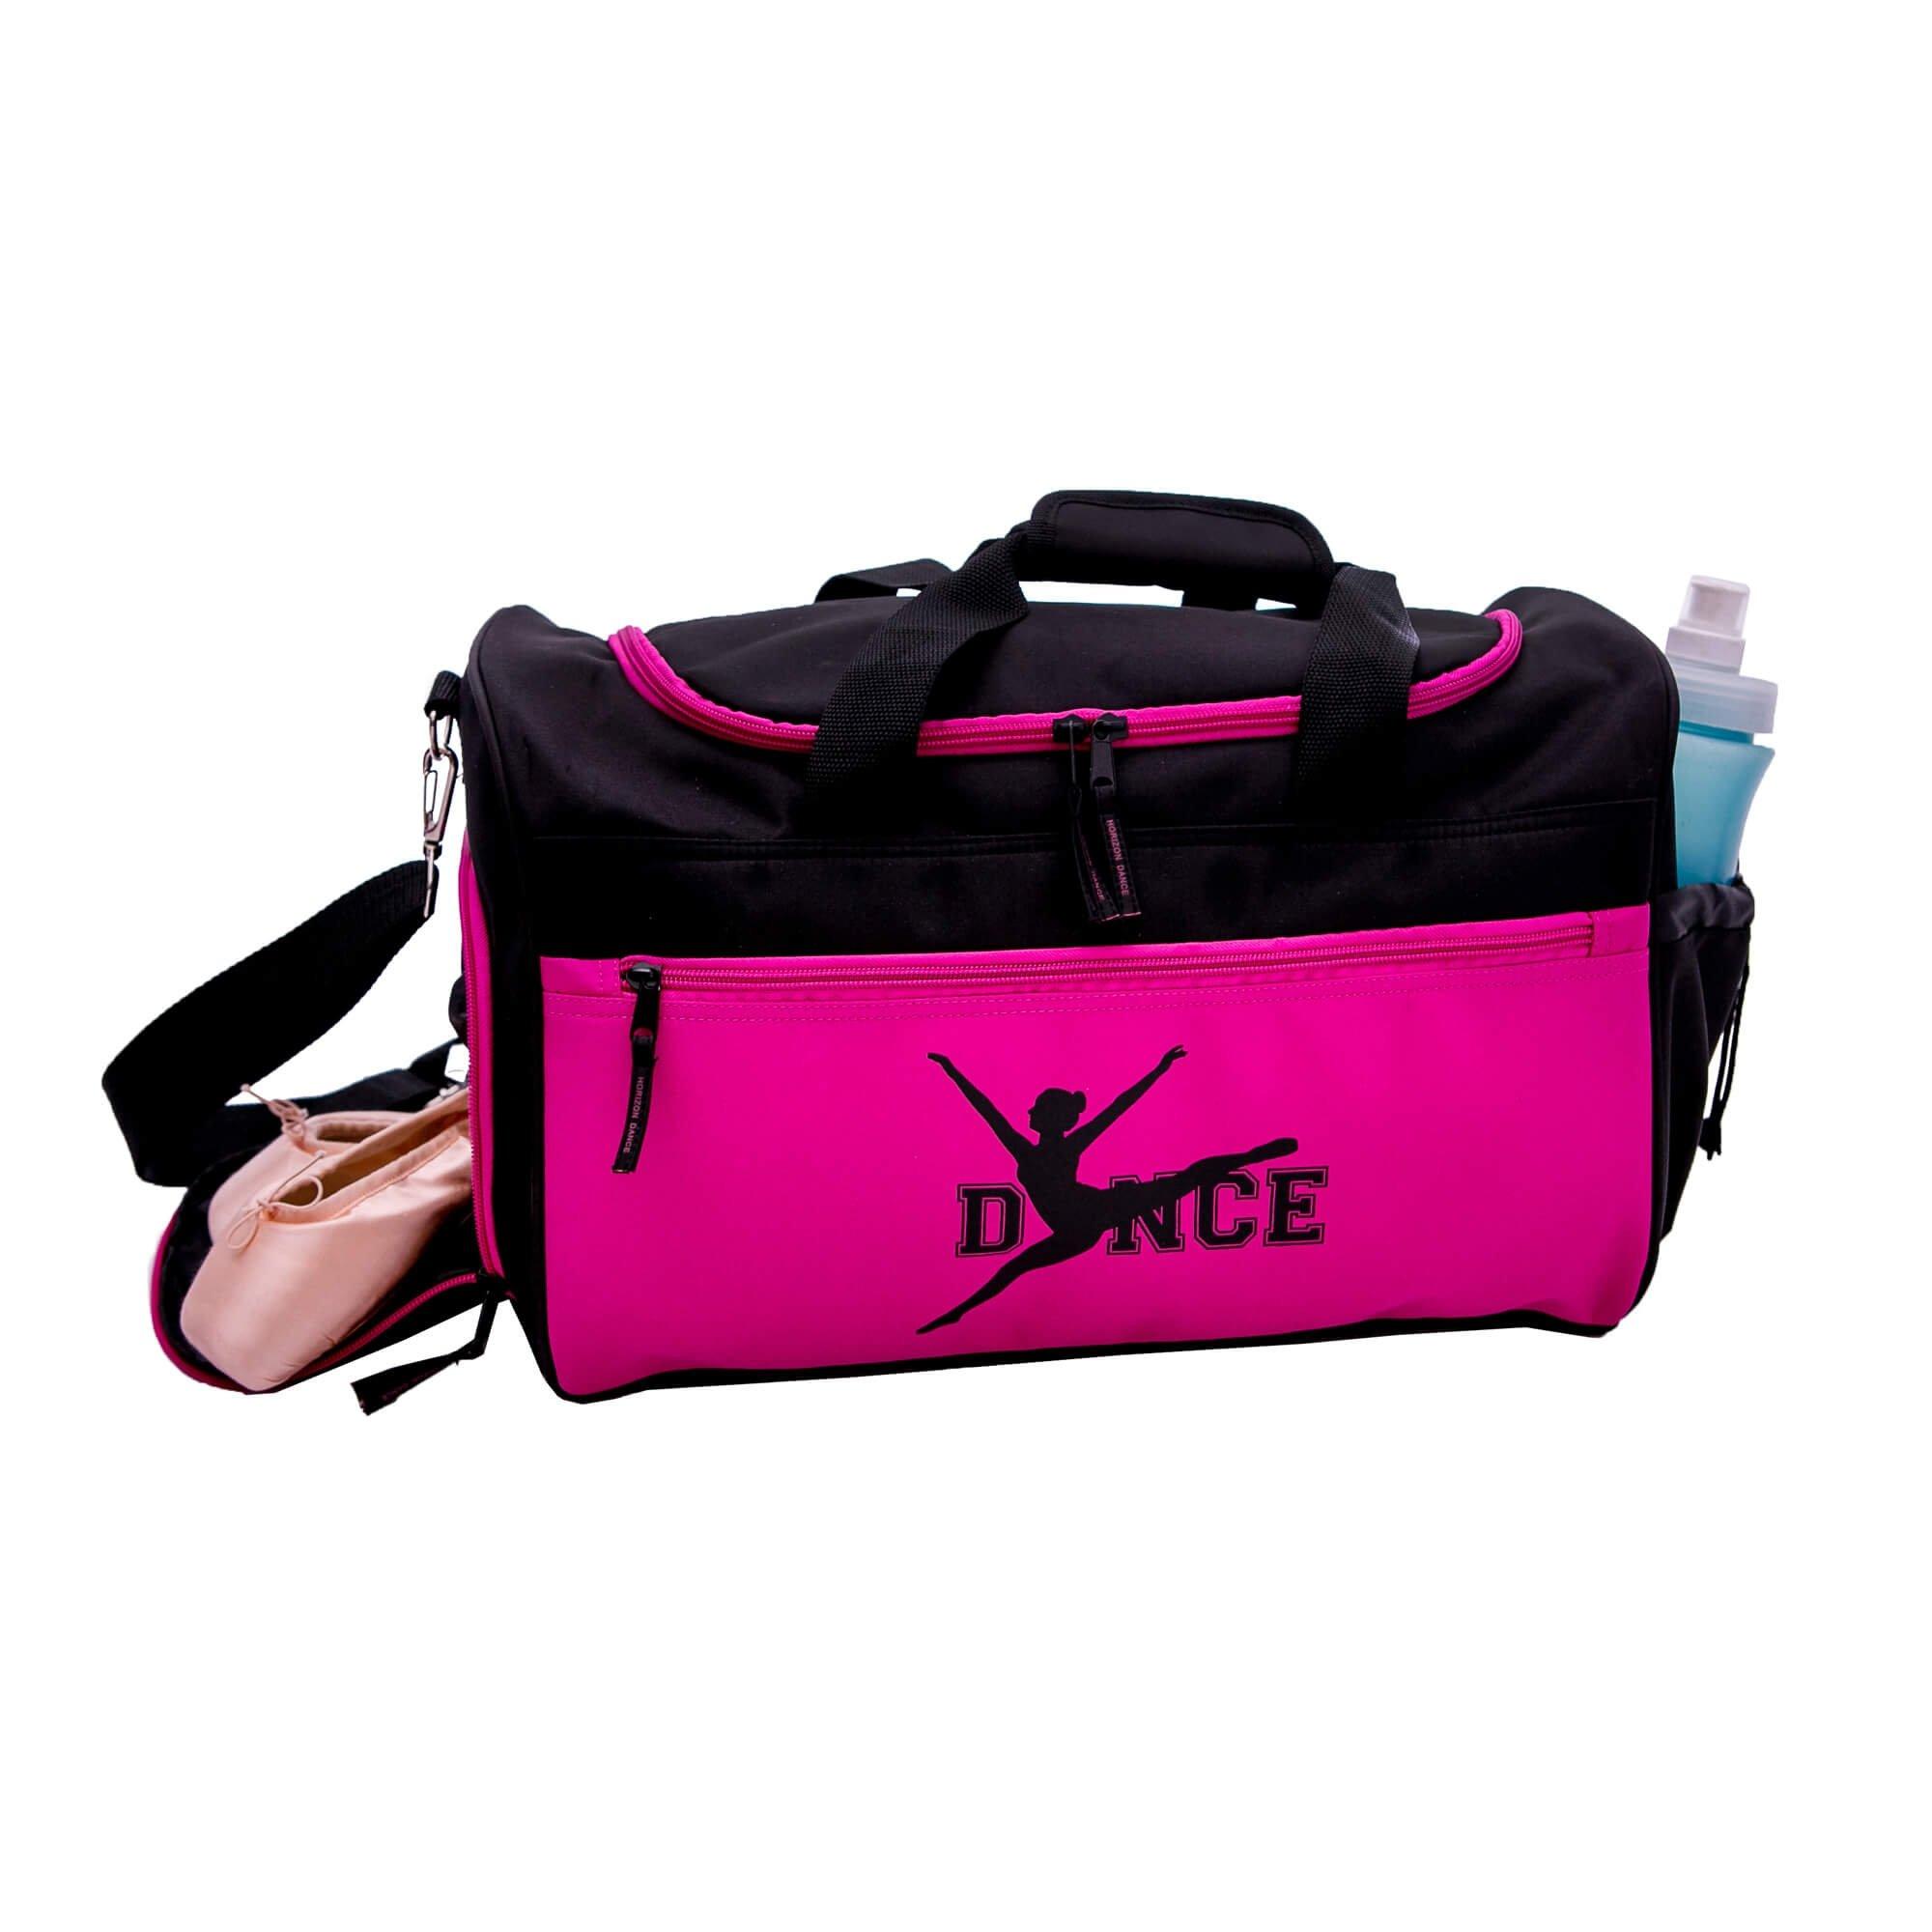 Horizon Dance Silhouette Gear Duffel